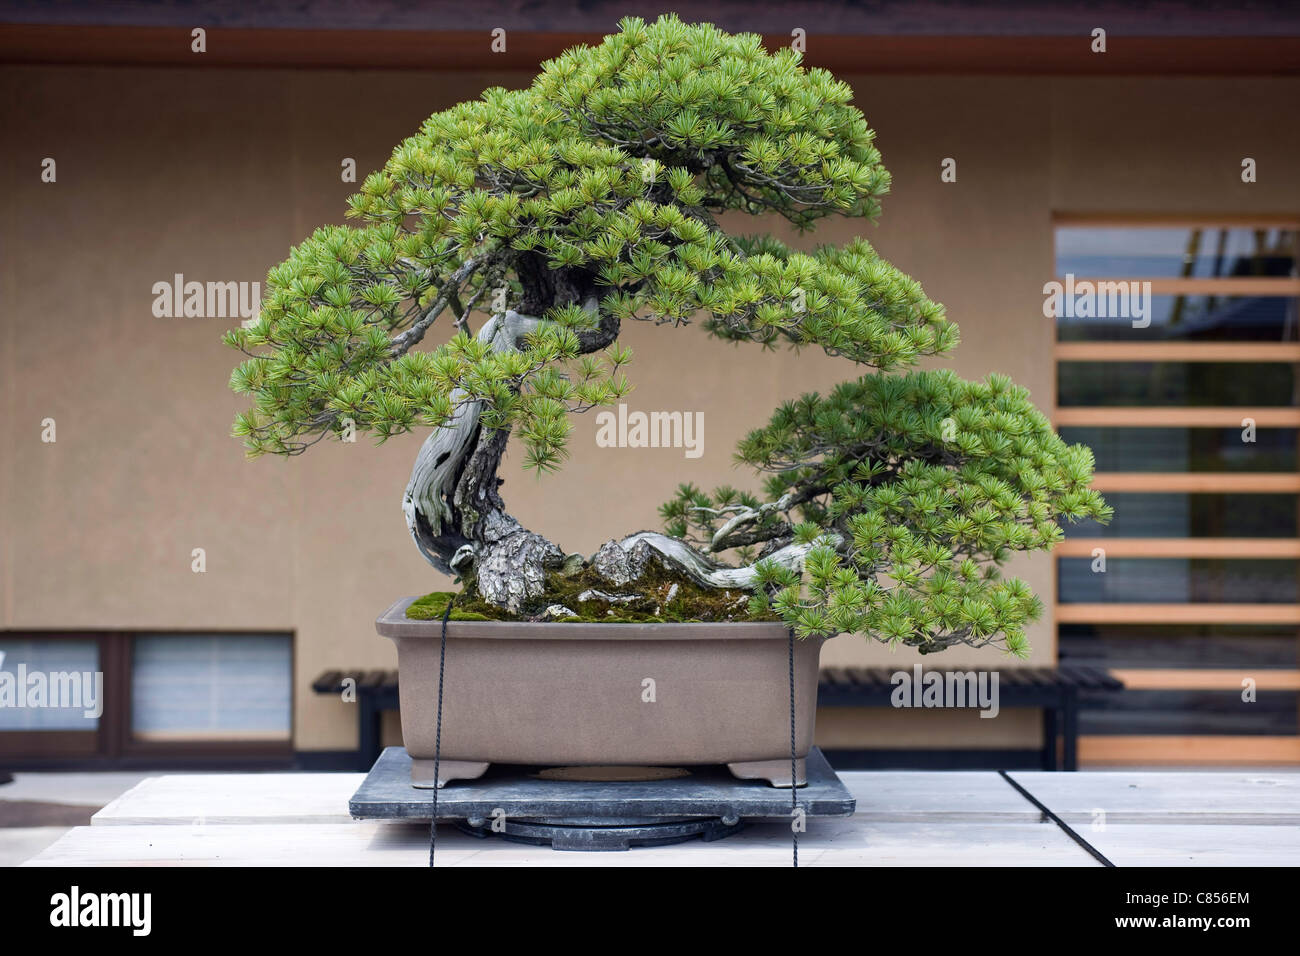 Photo shows 'Higurashi', a highly valued Japanese five-needled pine on display at the Saitama Omiya Bonsai - Stock Image